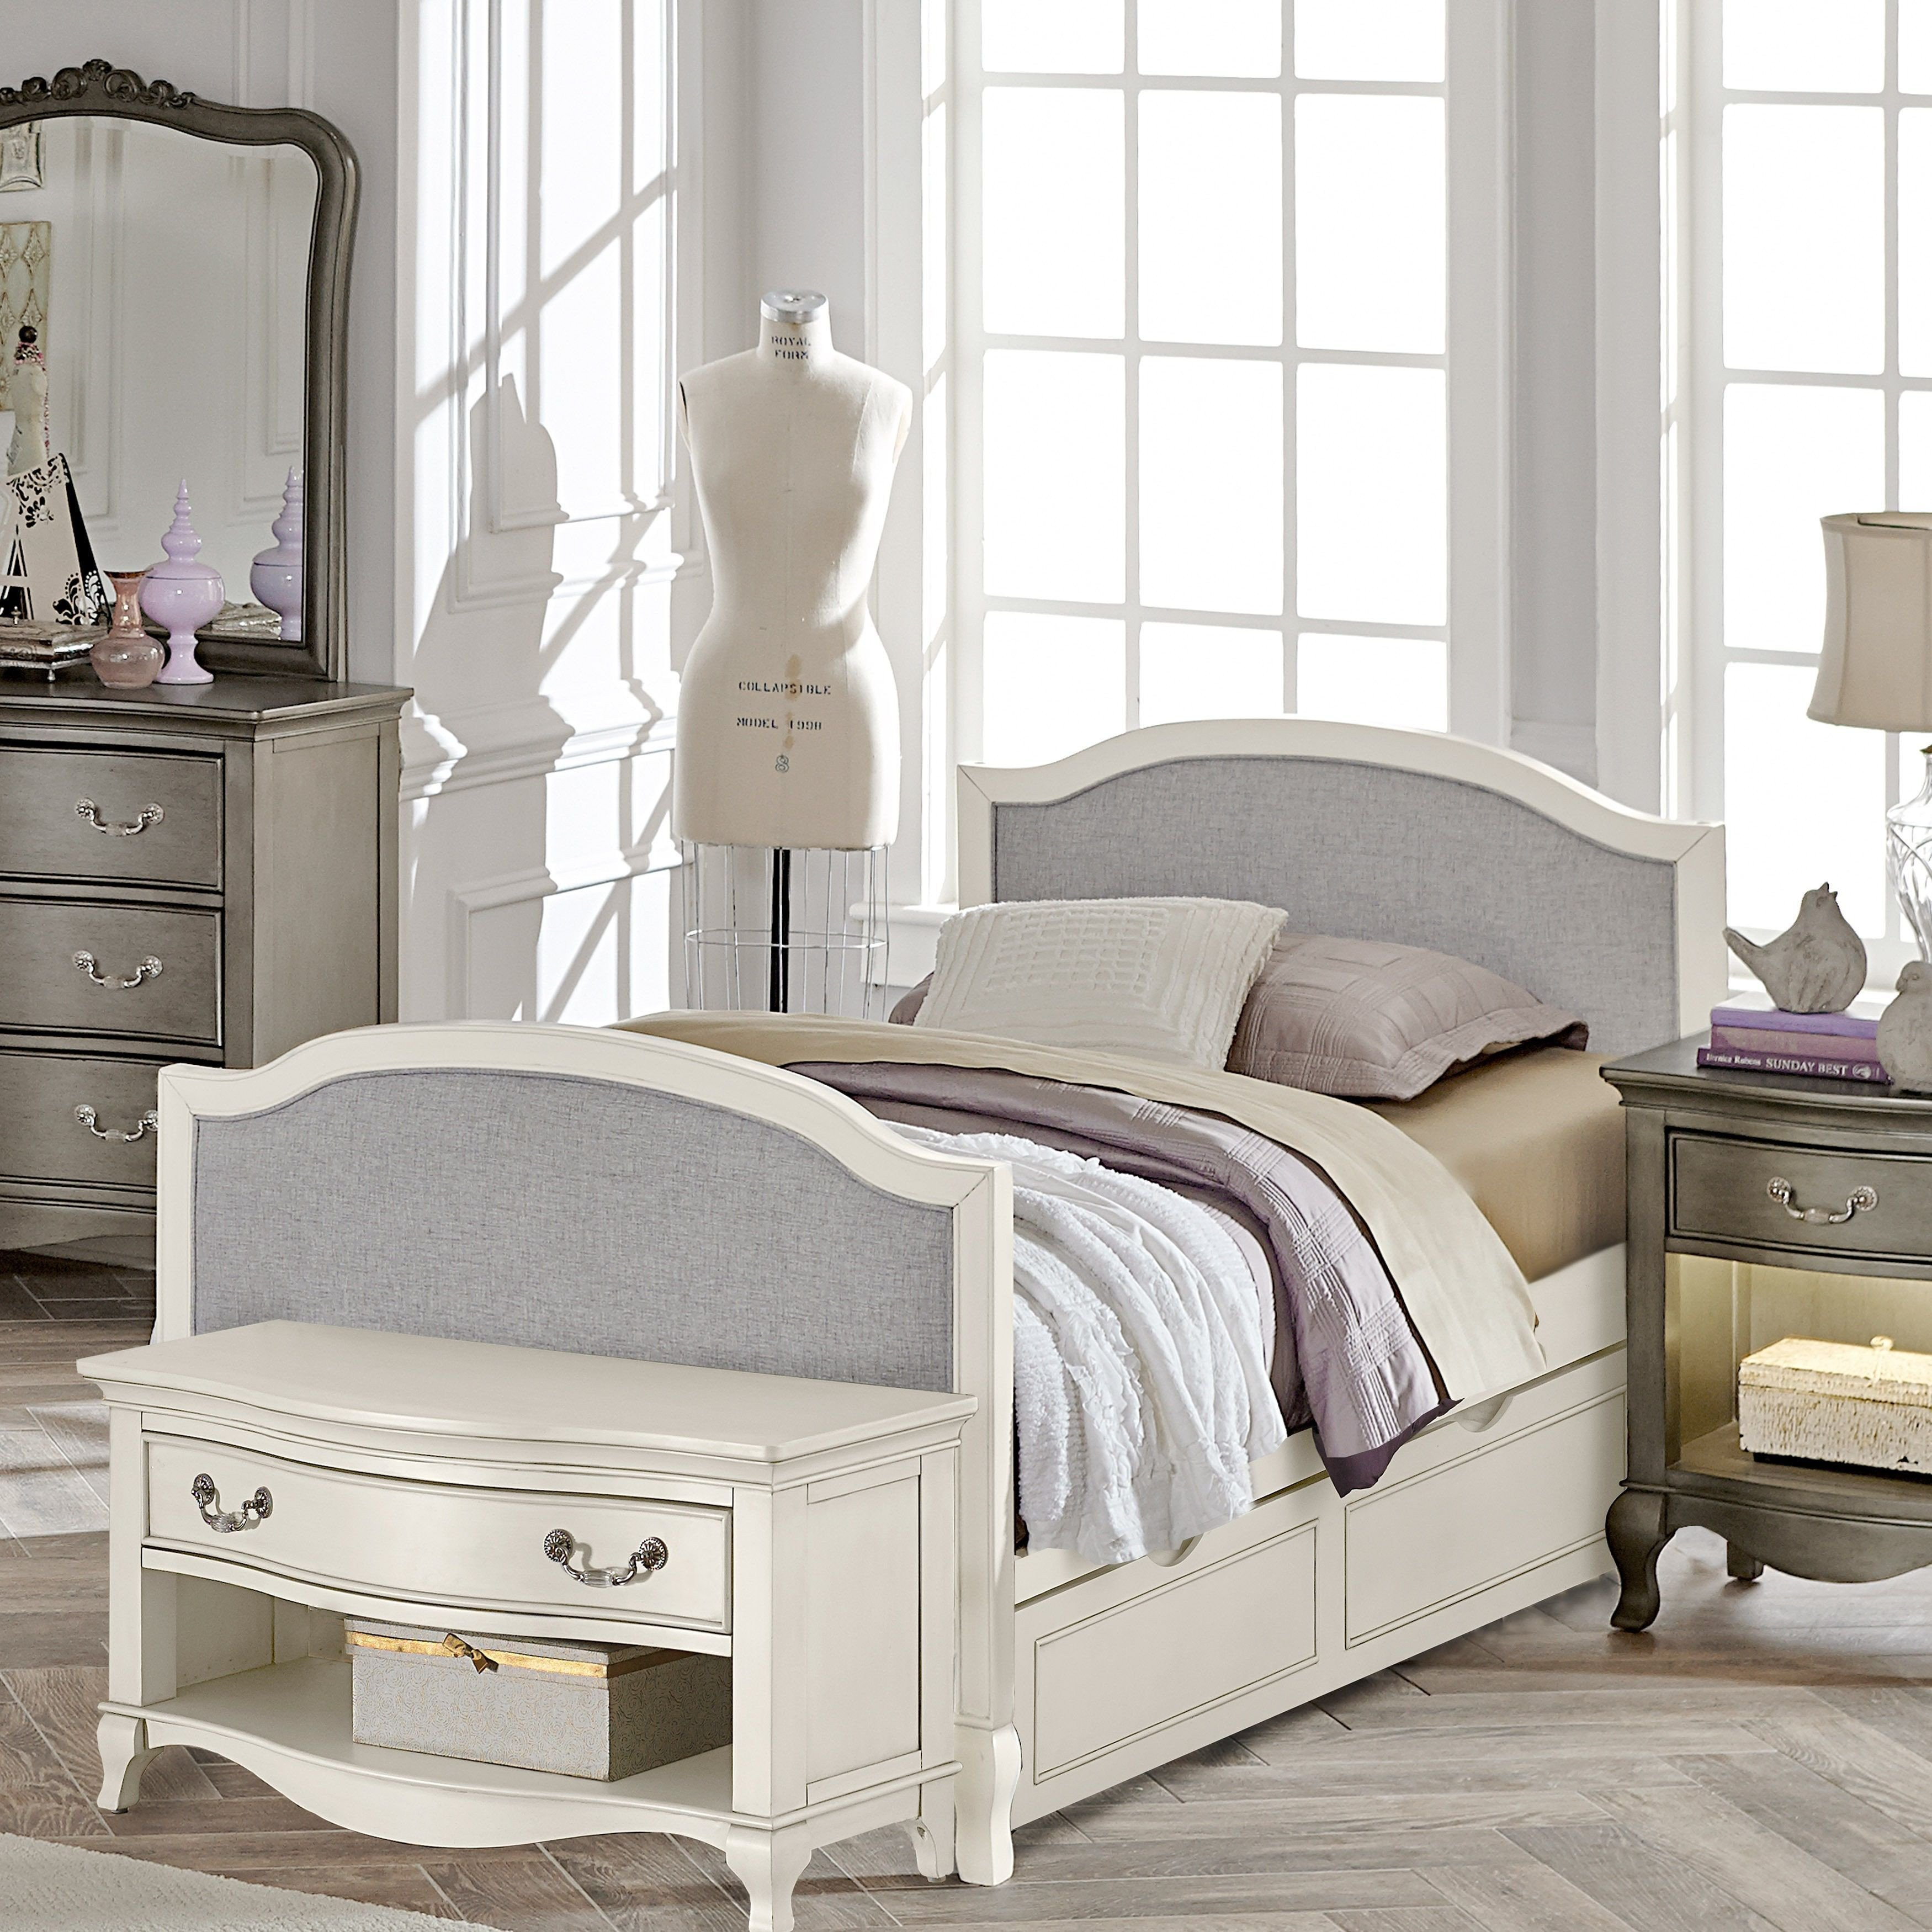 Twin Trundle Bedroom Set Elegant Kensington Victoria Antique White Twin Size Upholstered